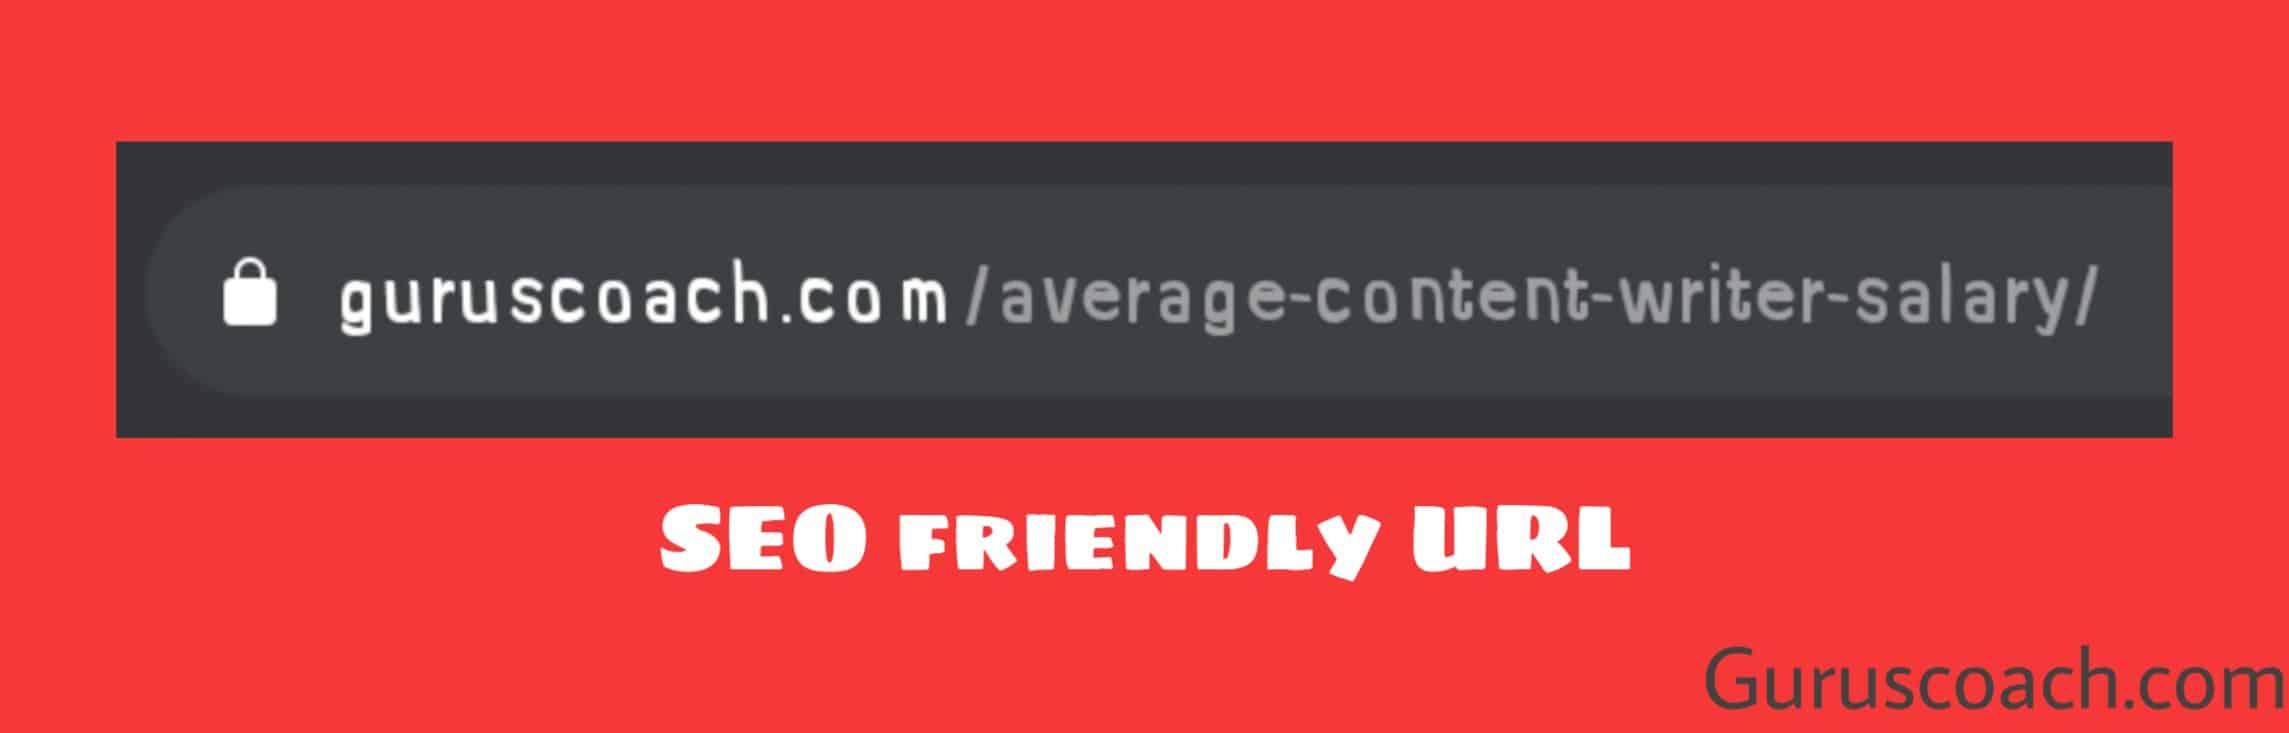 SEO Friendly URL - Guruscoach.com